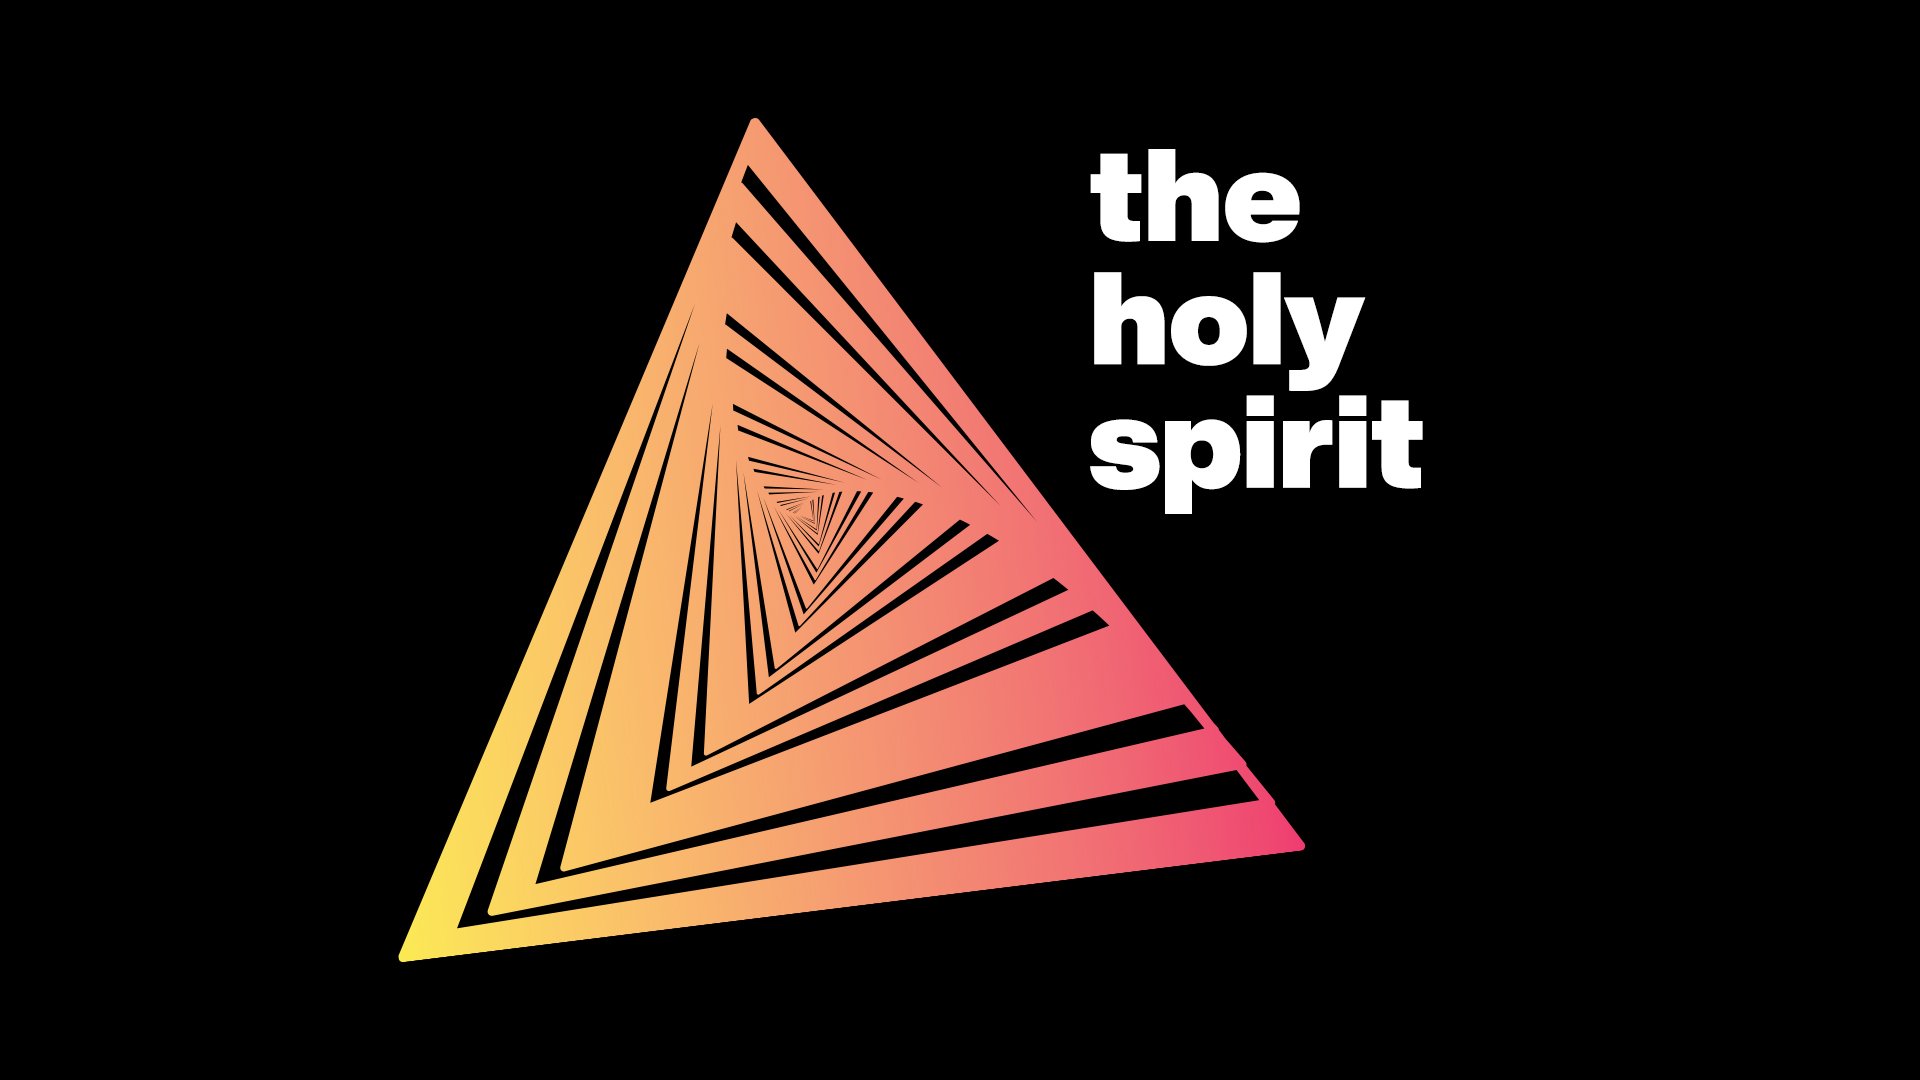 the holy spirit - 1920x1080